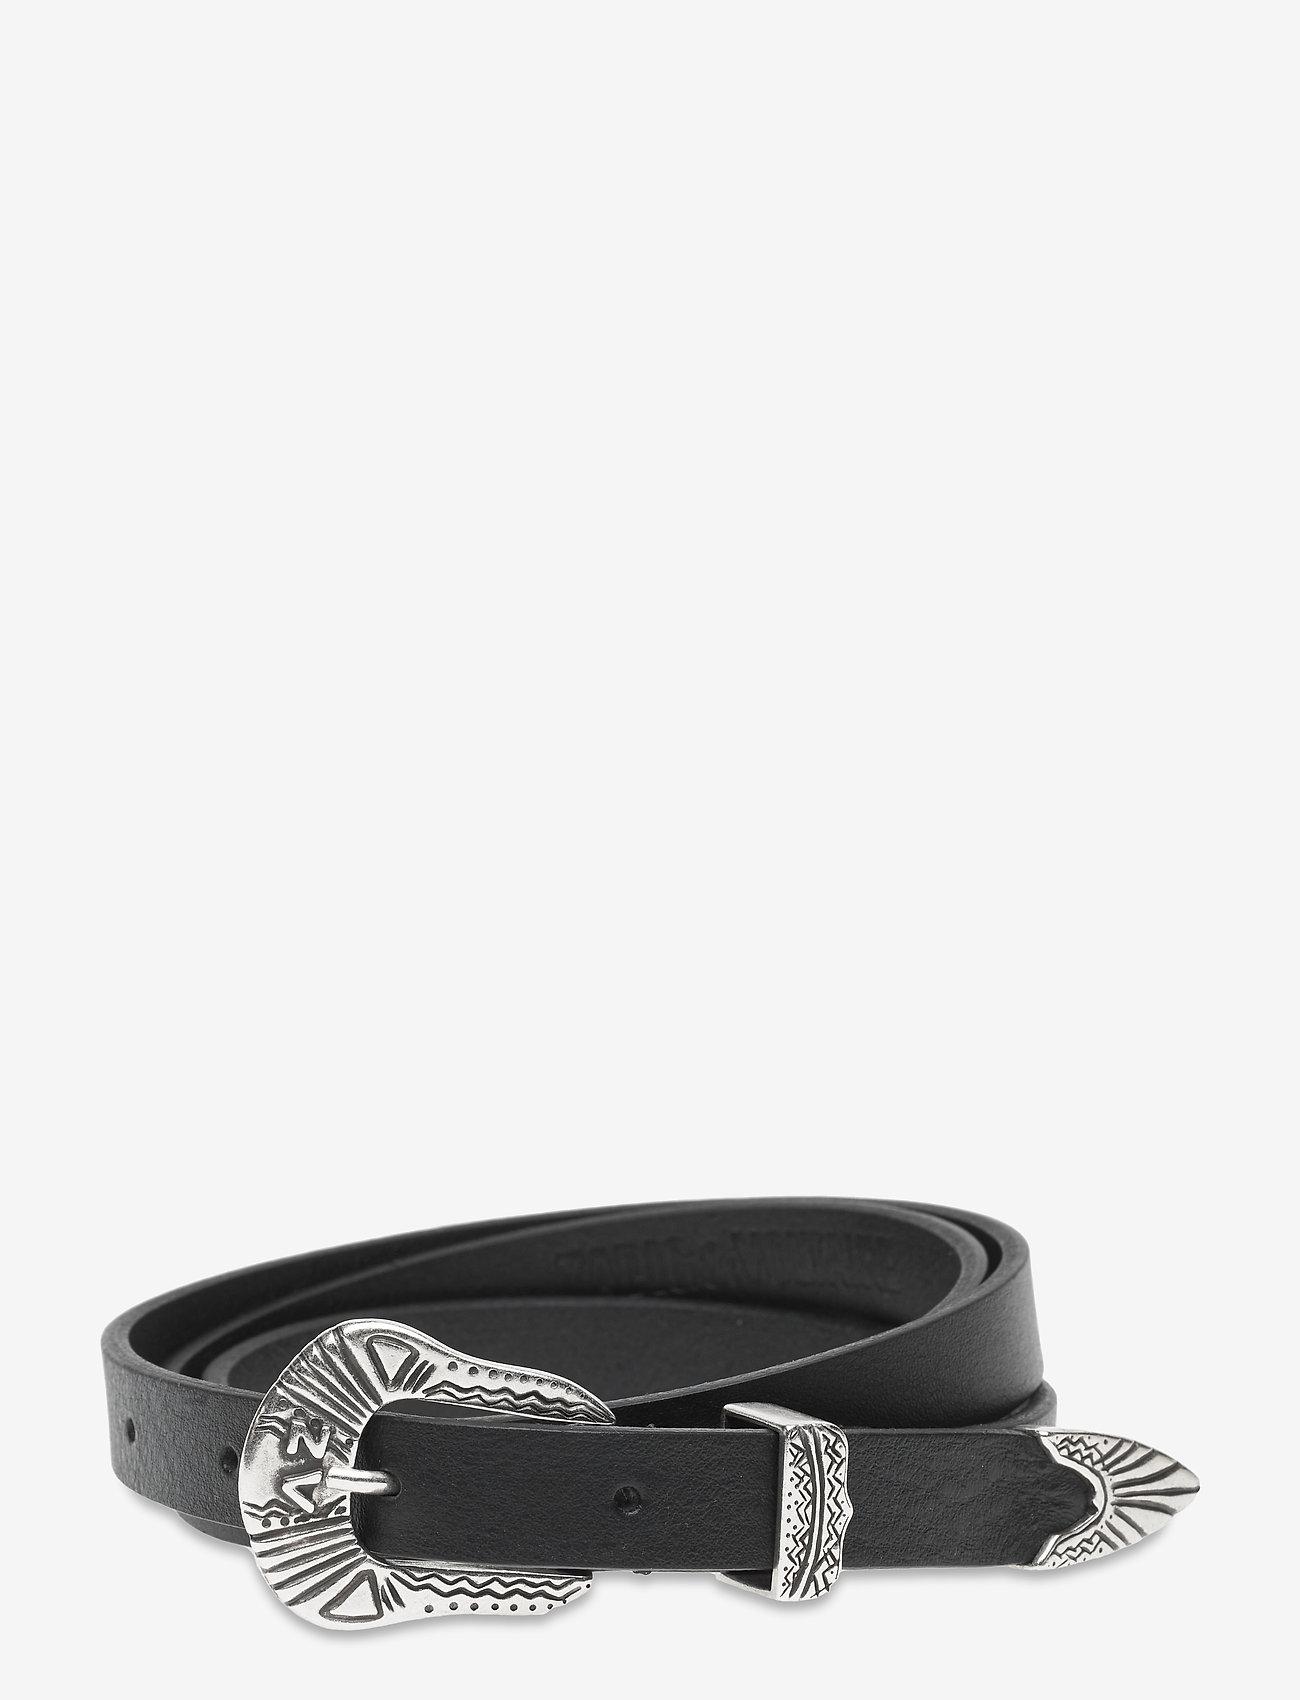 Zadig & Voltaire - ALTA SMOOTH LEATHER - accessories - black - 0